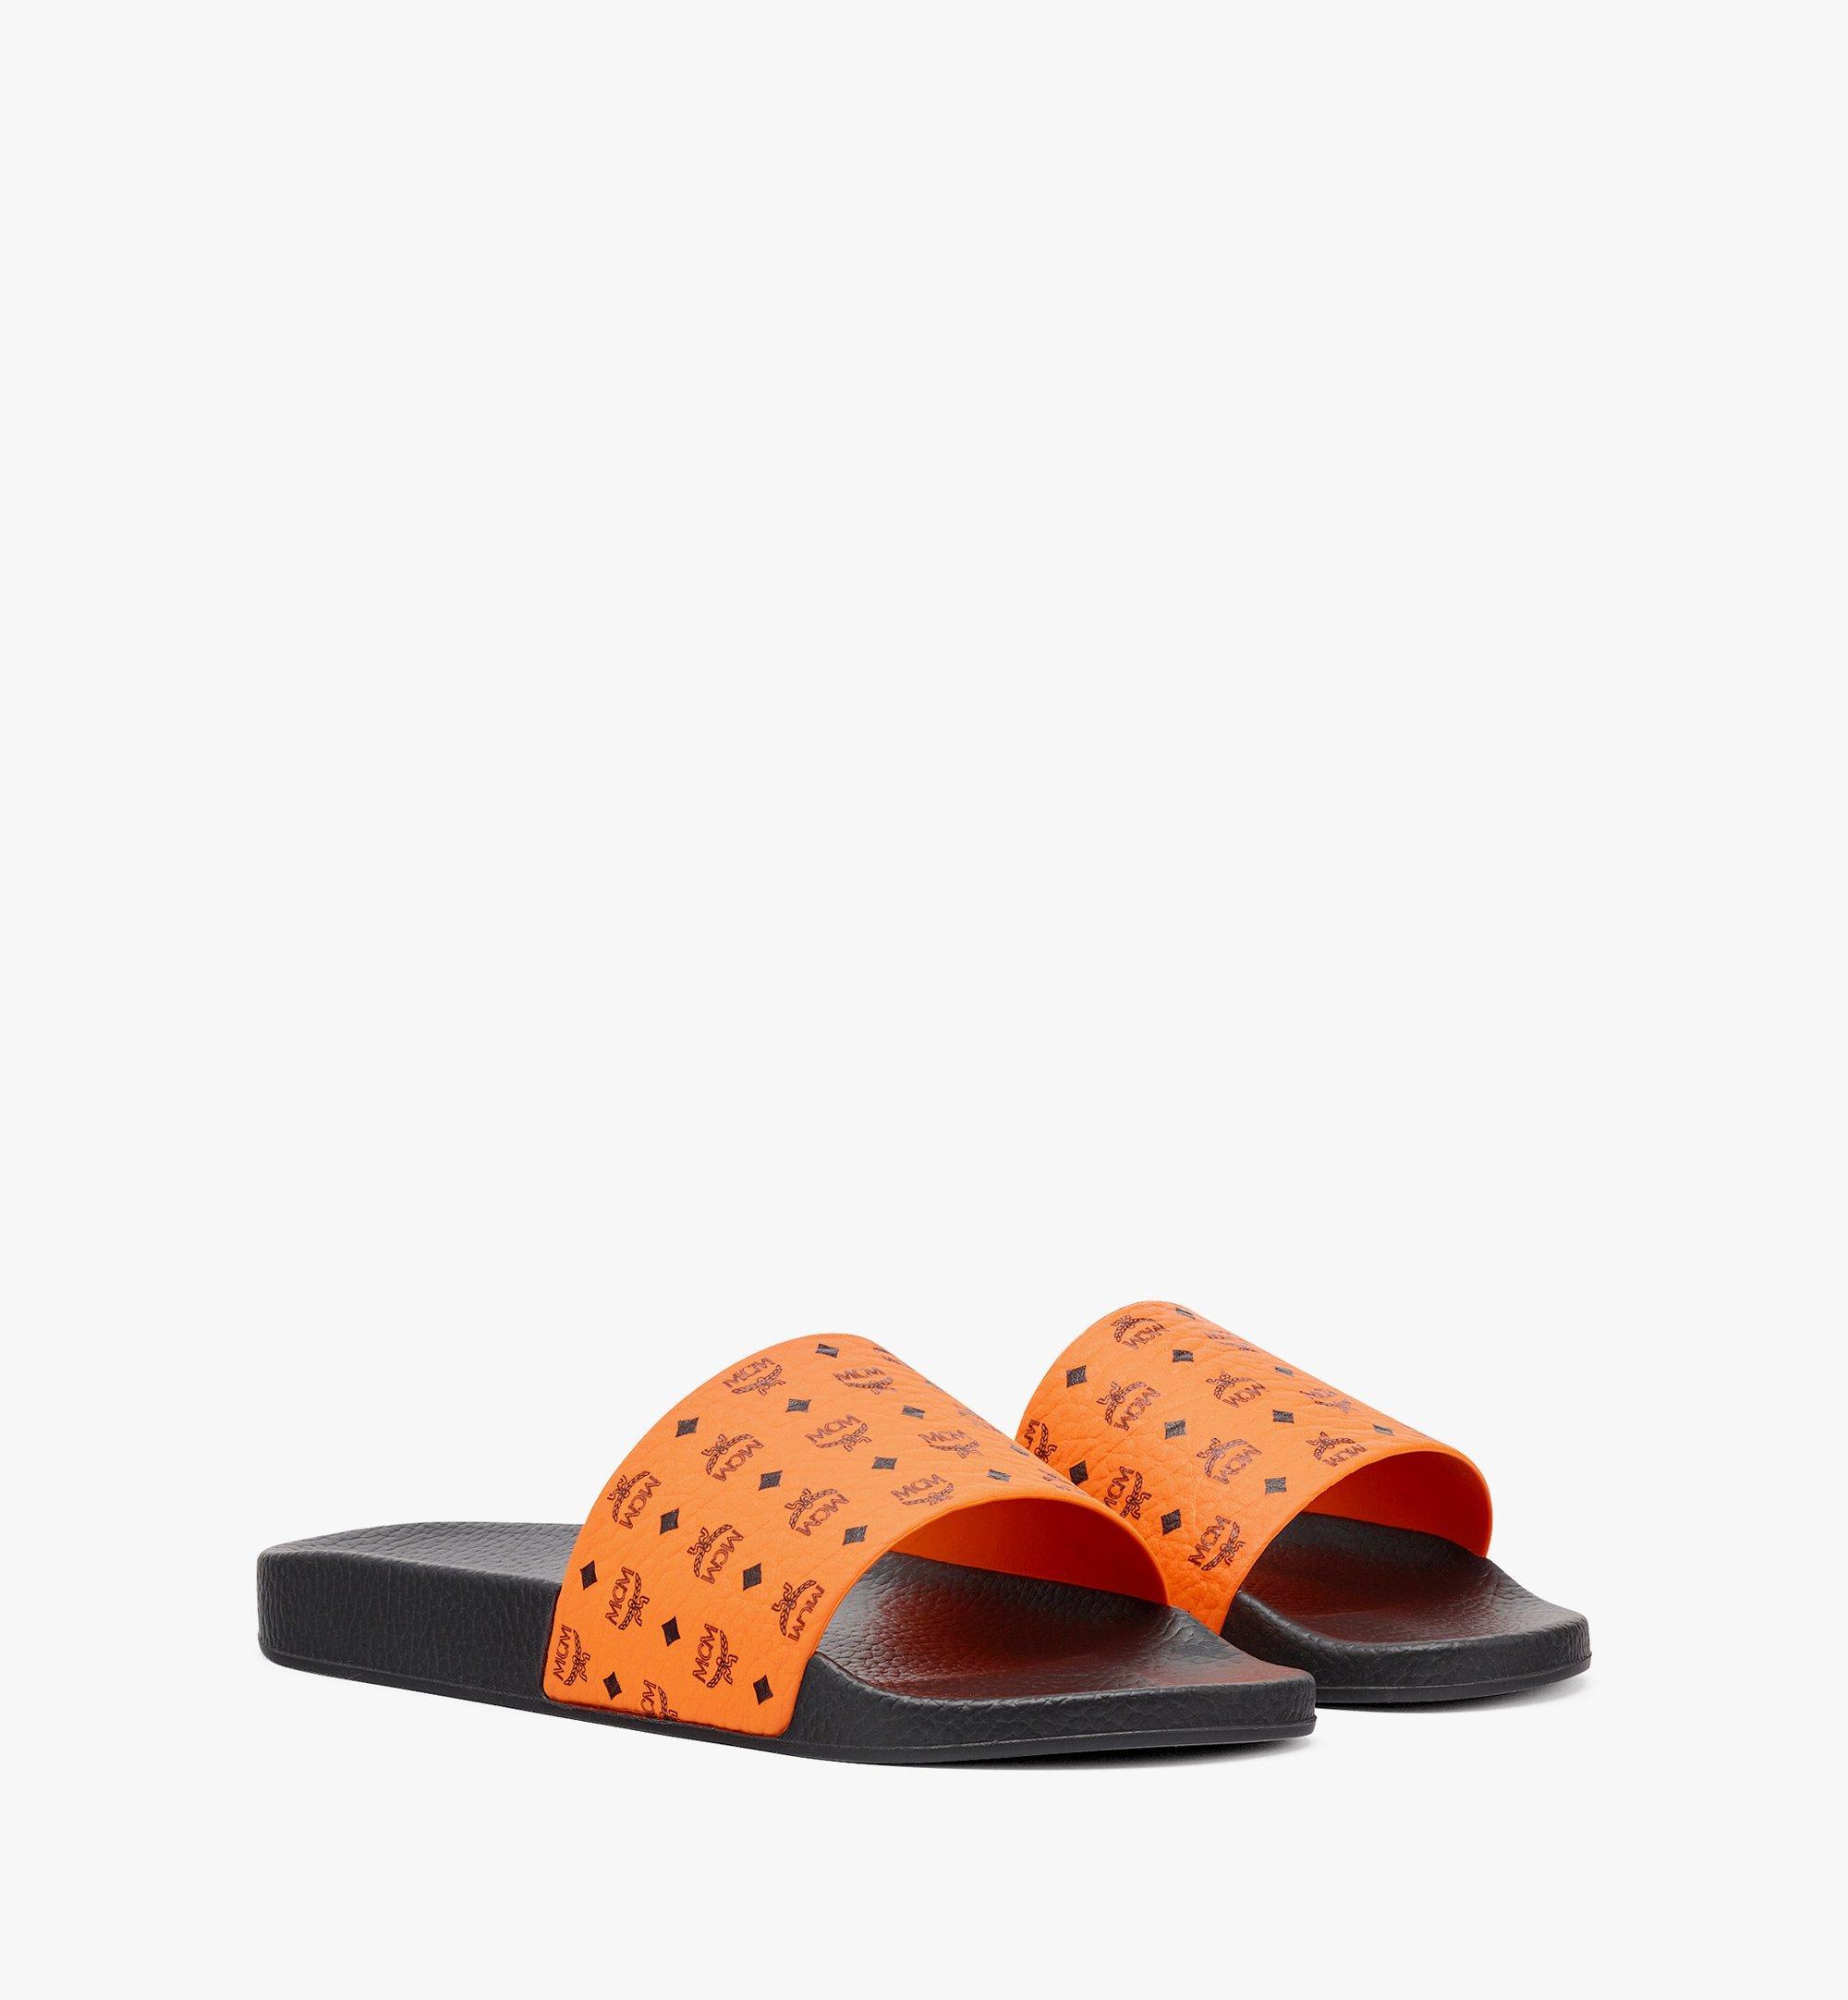 MCM 남성용 비세토스 러버 슬라이드 Orange MEX8AMM60O9041 다른 각도 보기 1